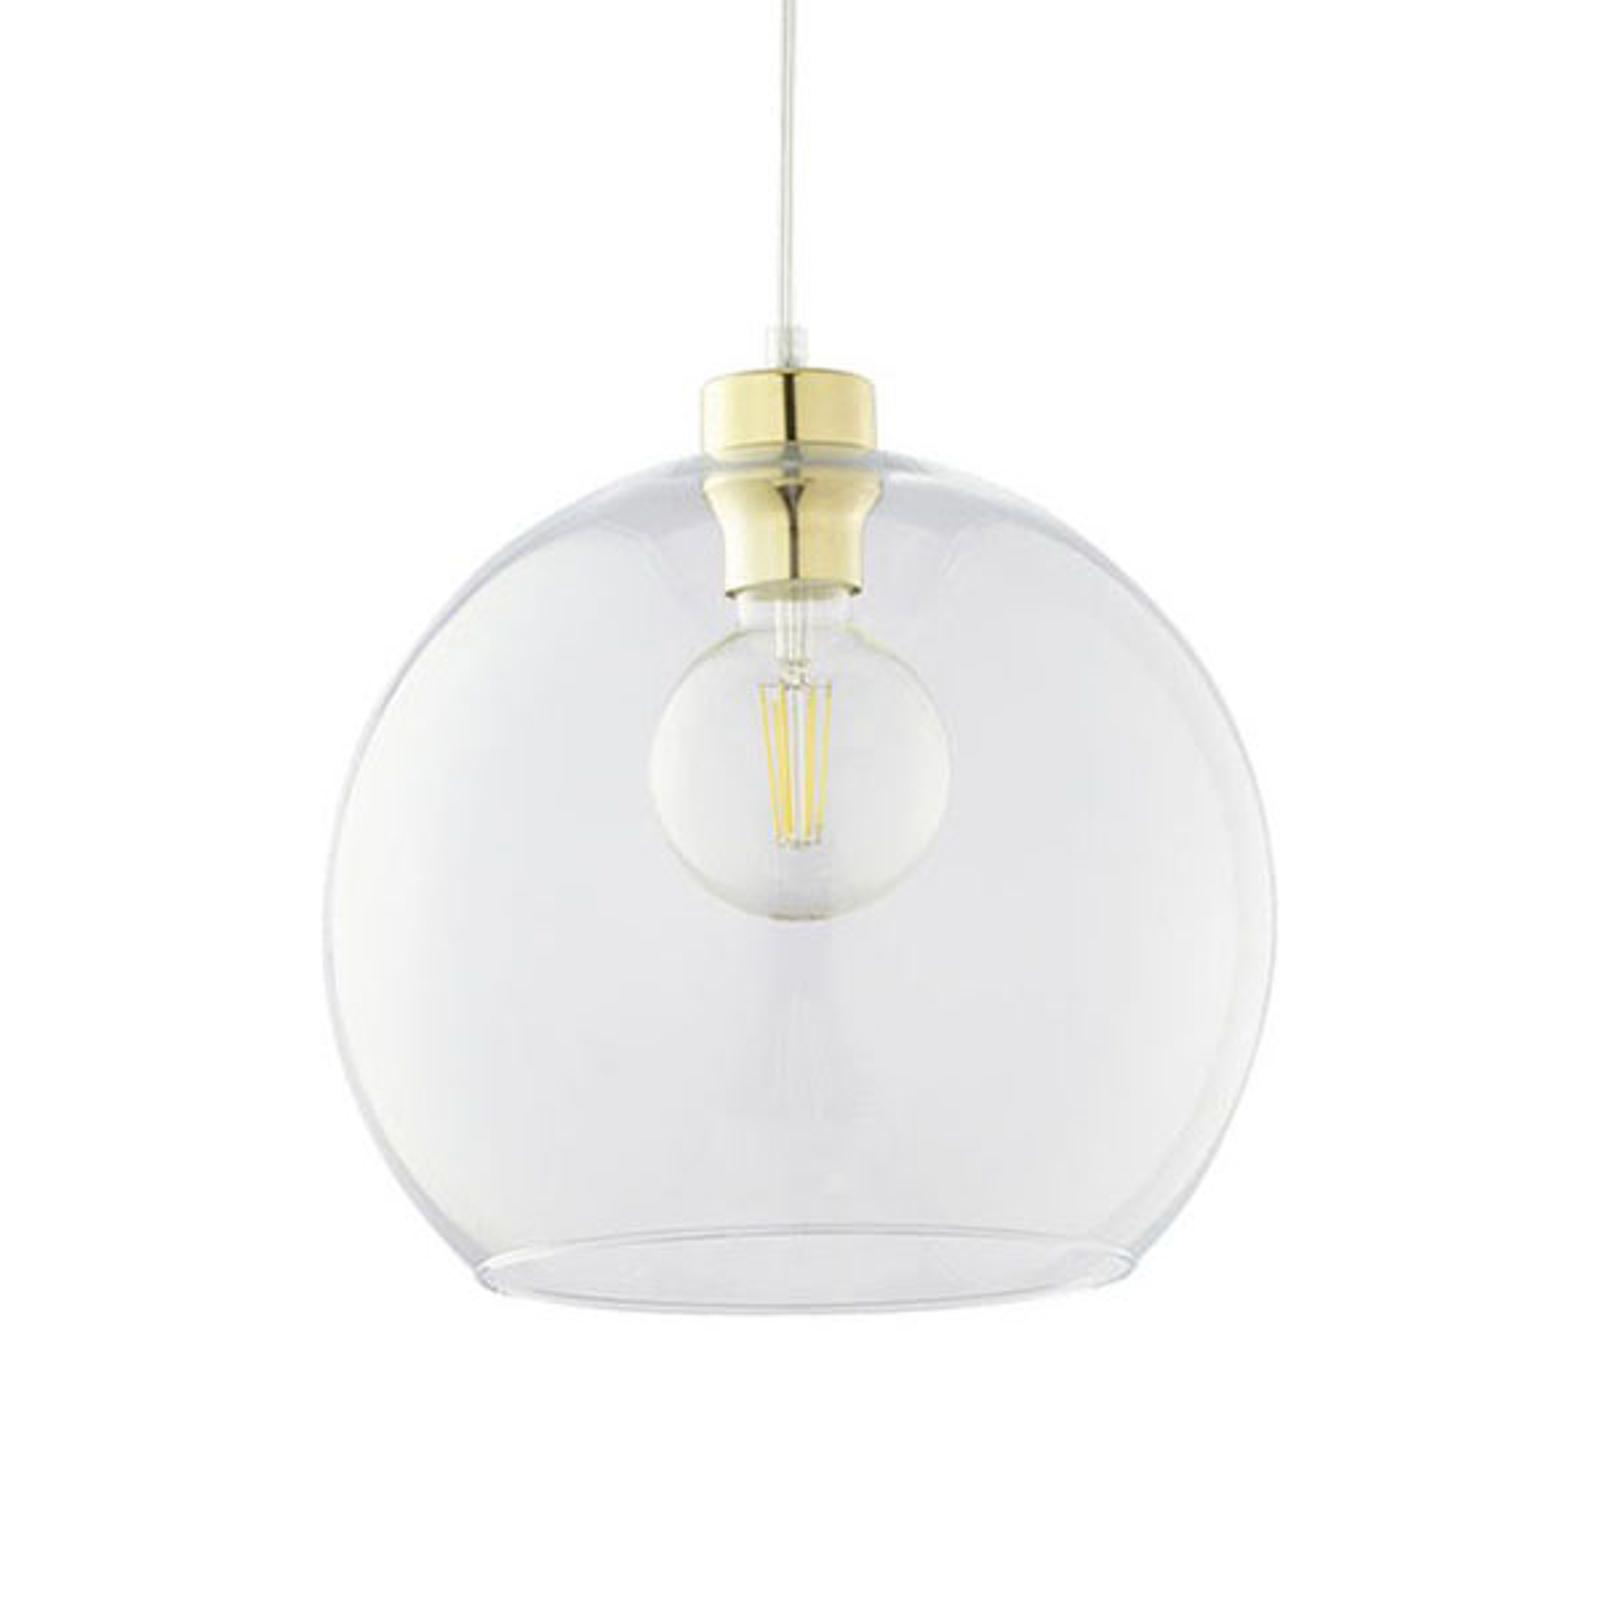 Lampa wisząca Cubus, 1-punktowa, biała